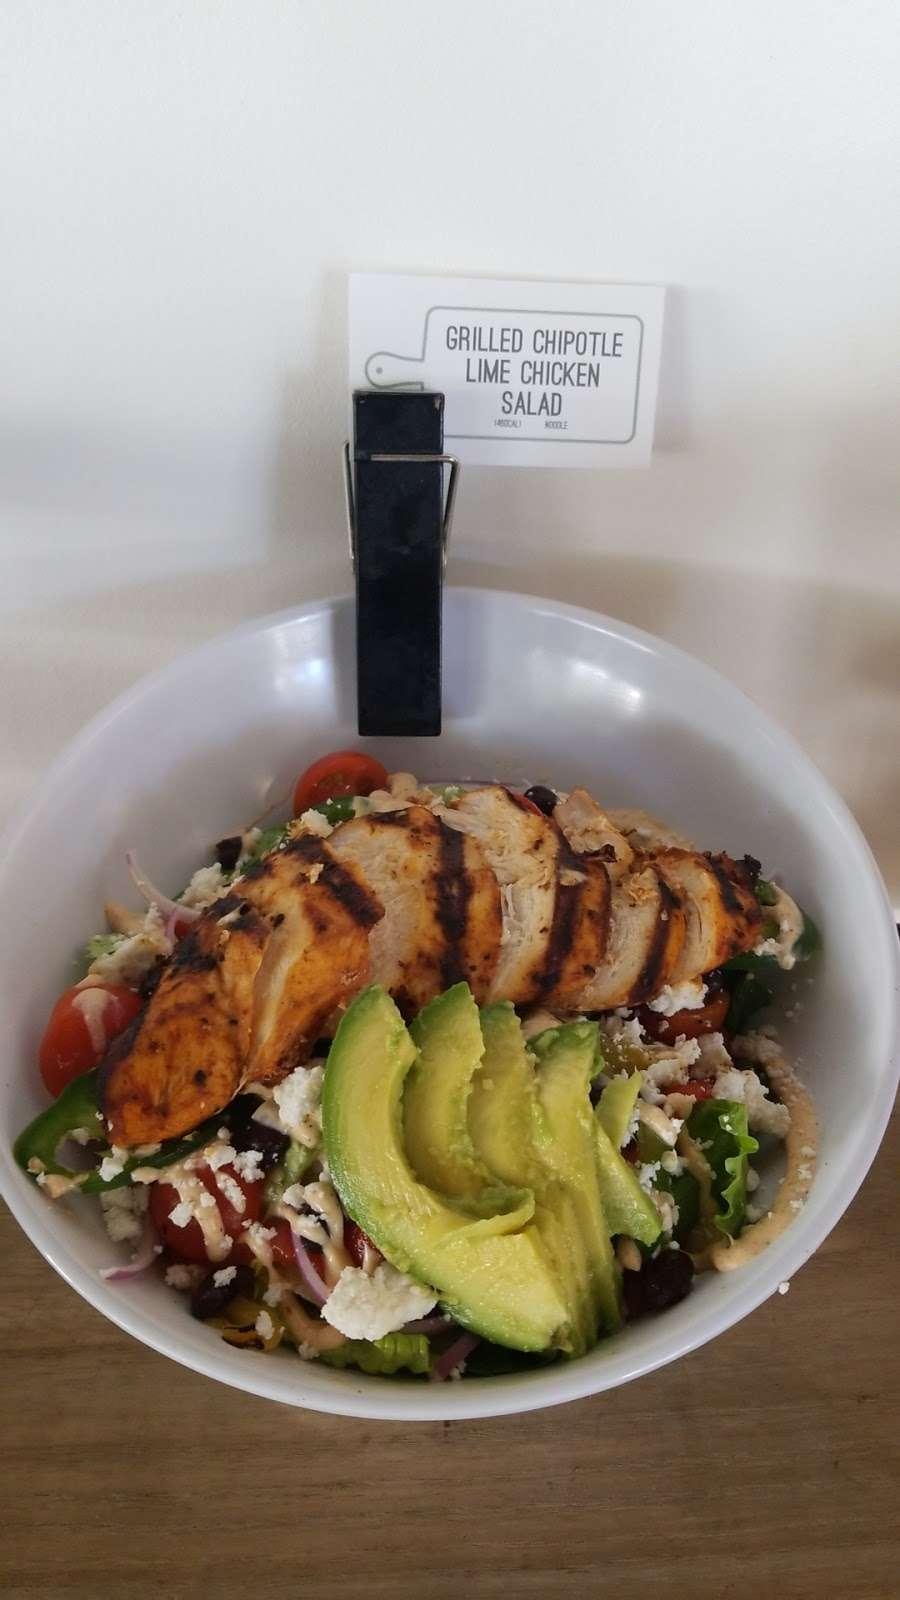 Mission Cafe - restaurant  | Photo 5 of 10 | Address: 3979 Freedom Cir, Santa Clara, CA 95054, USA